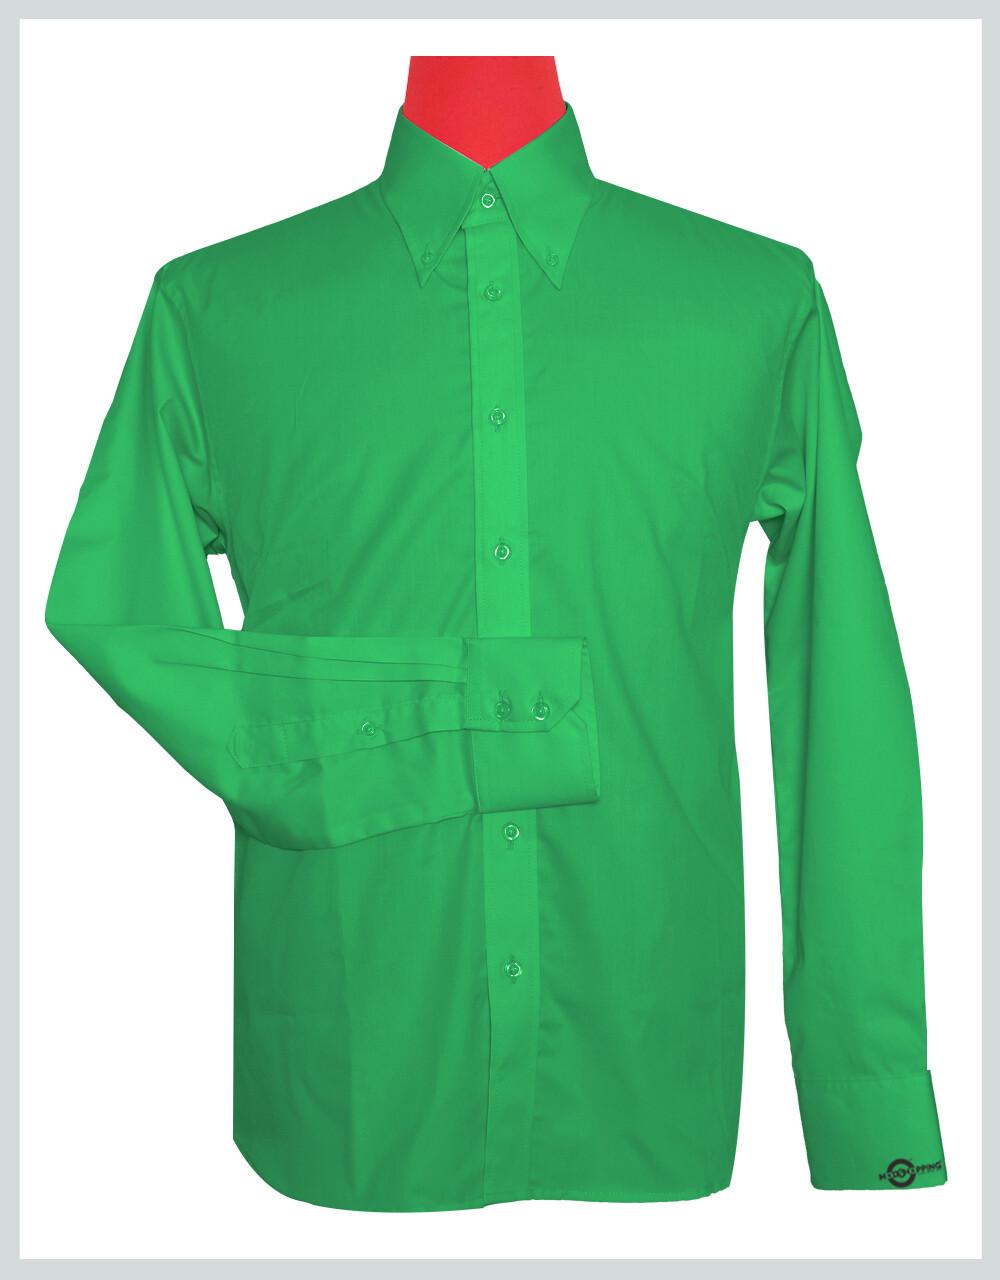 Button-Down Collar Shirt | Green Color Shirt For Man